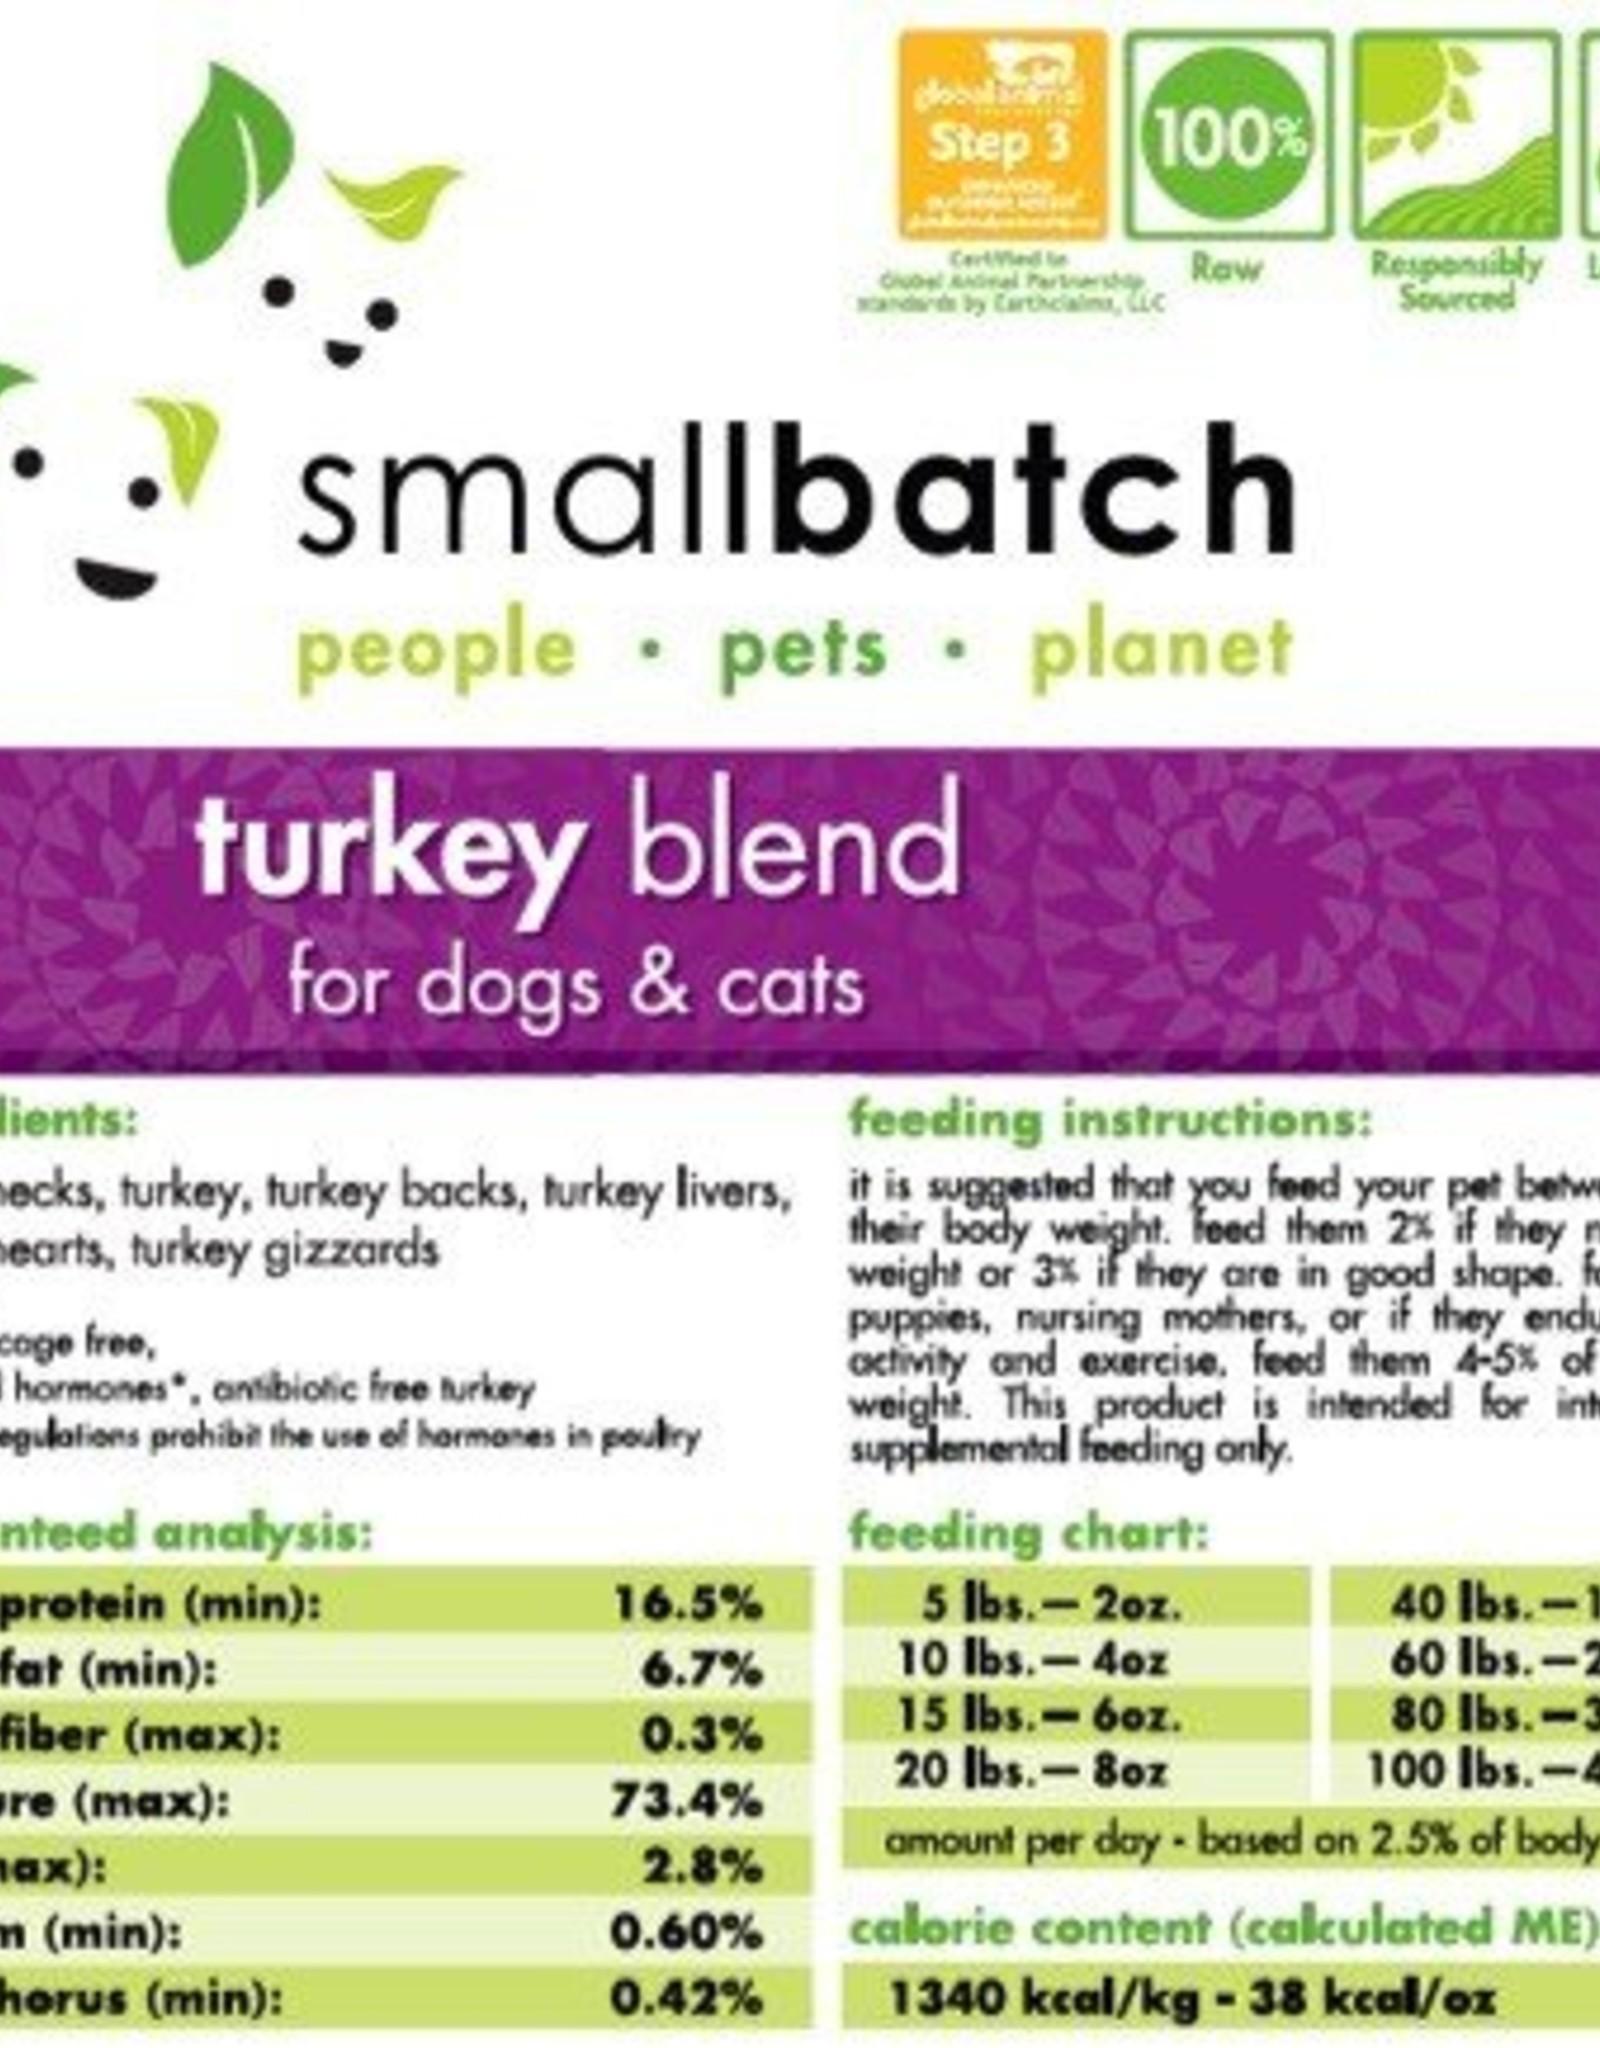 Smallbatch Smallbatch Turkey Blend 2lb